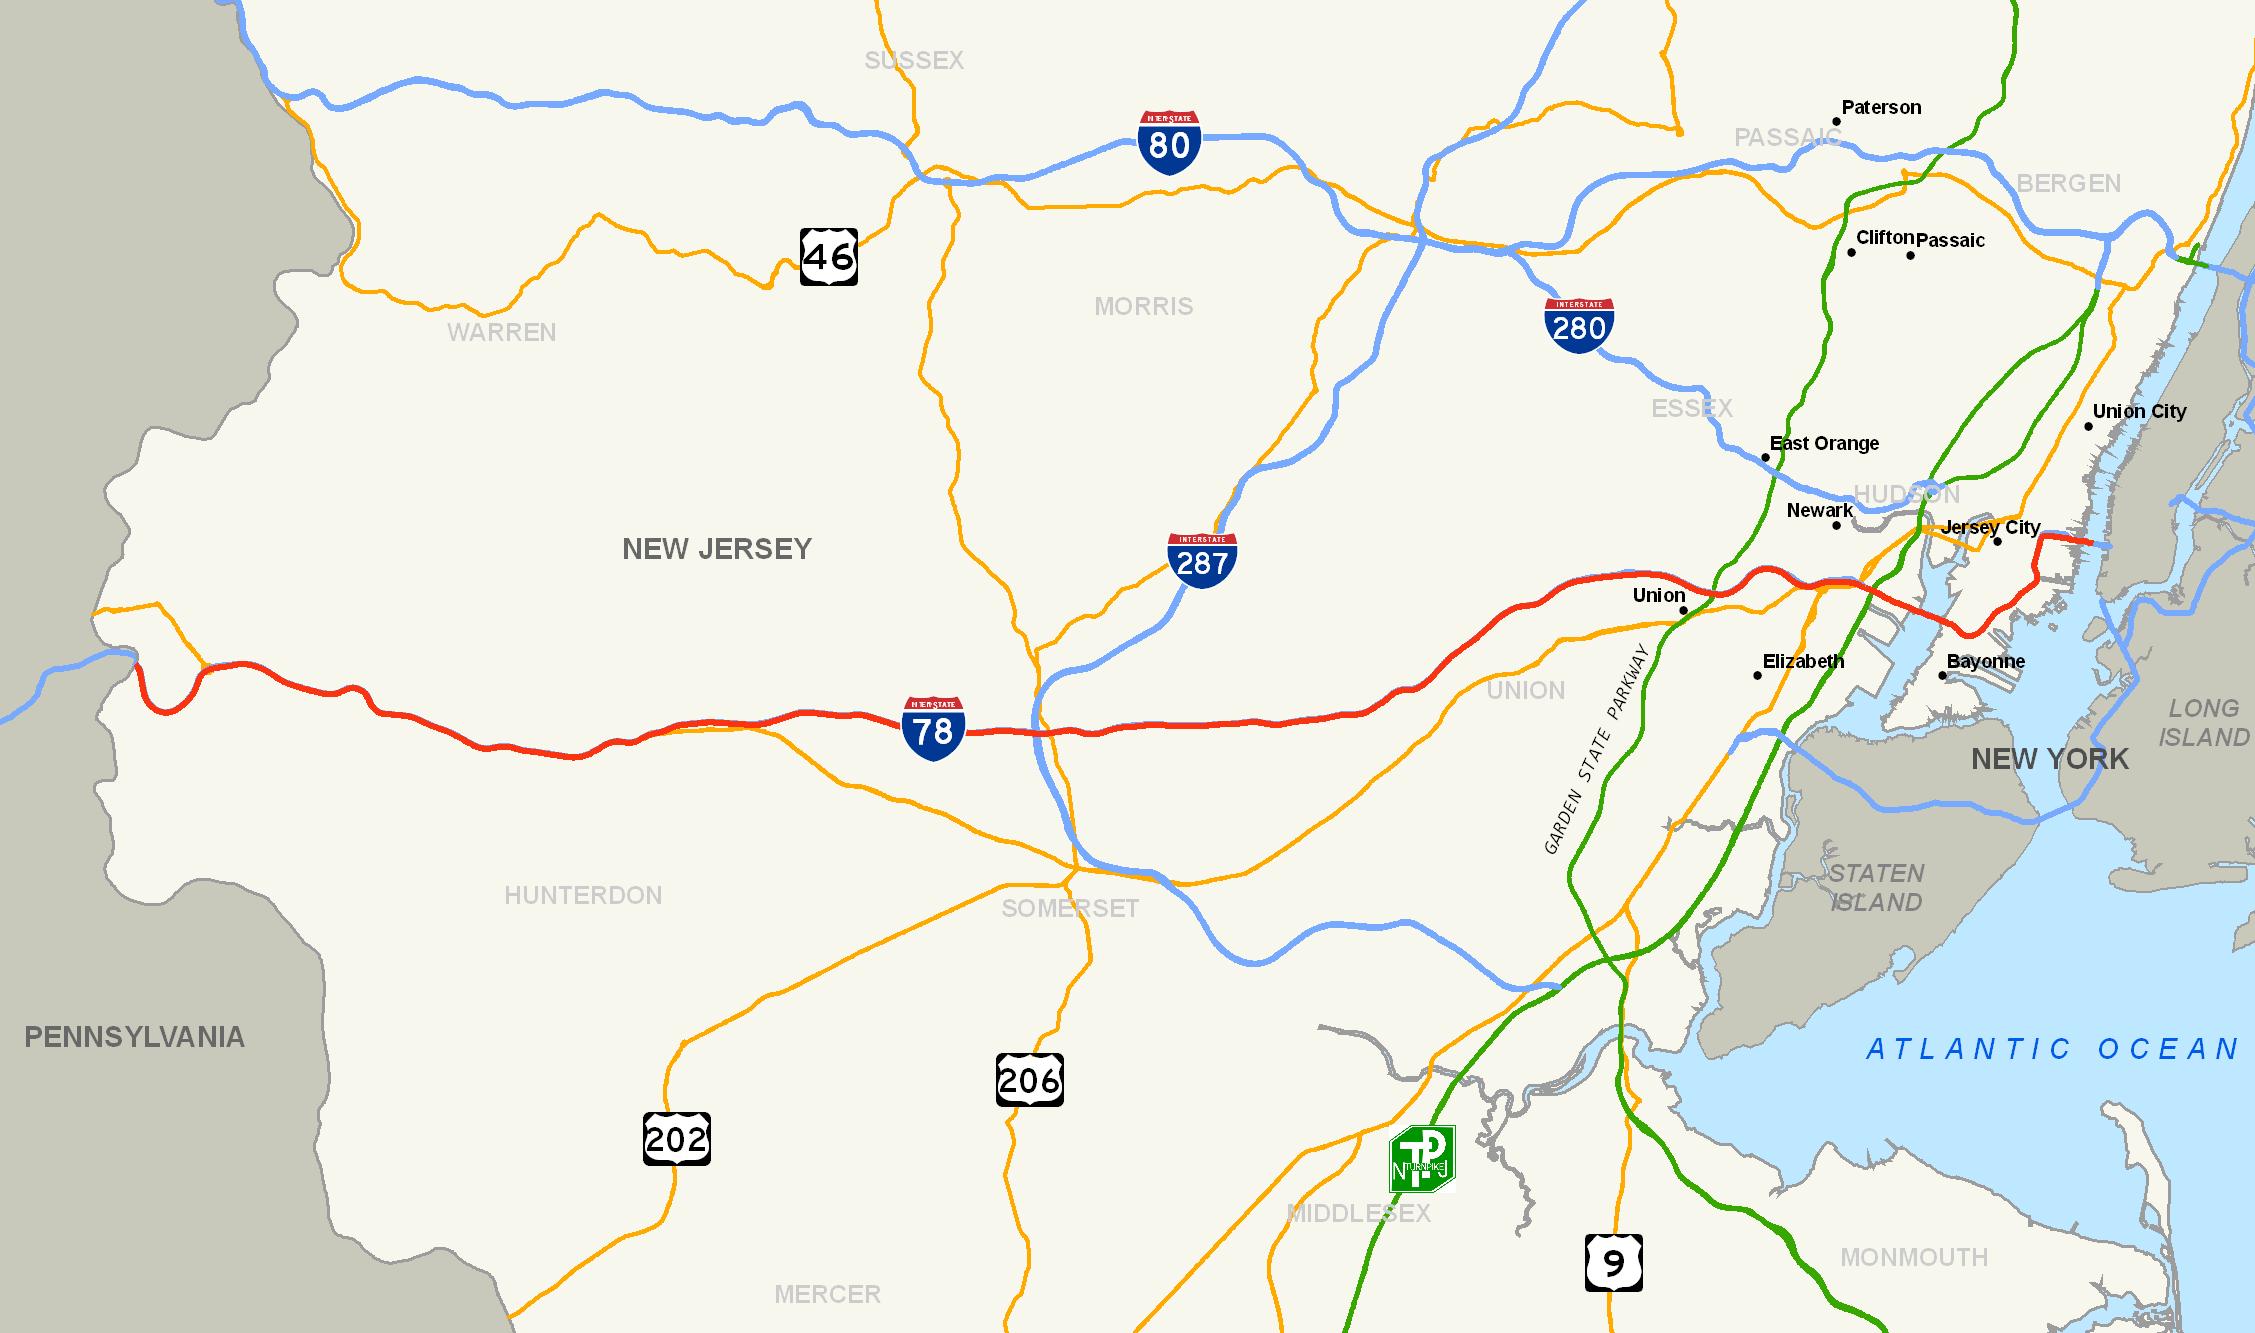 FileInterstate NJ Mappng Wikimedia Commons - New jersey road map